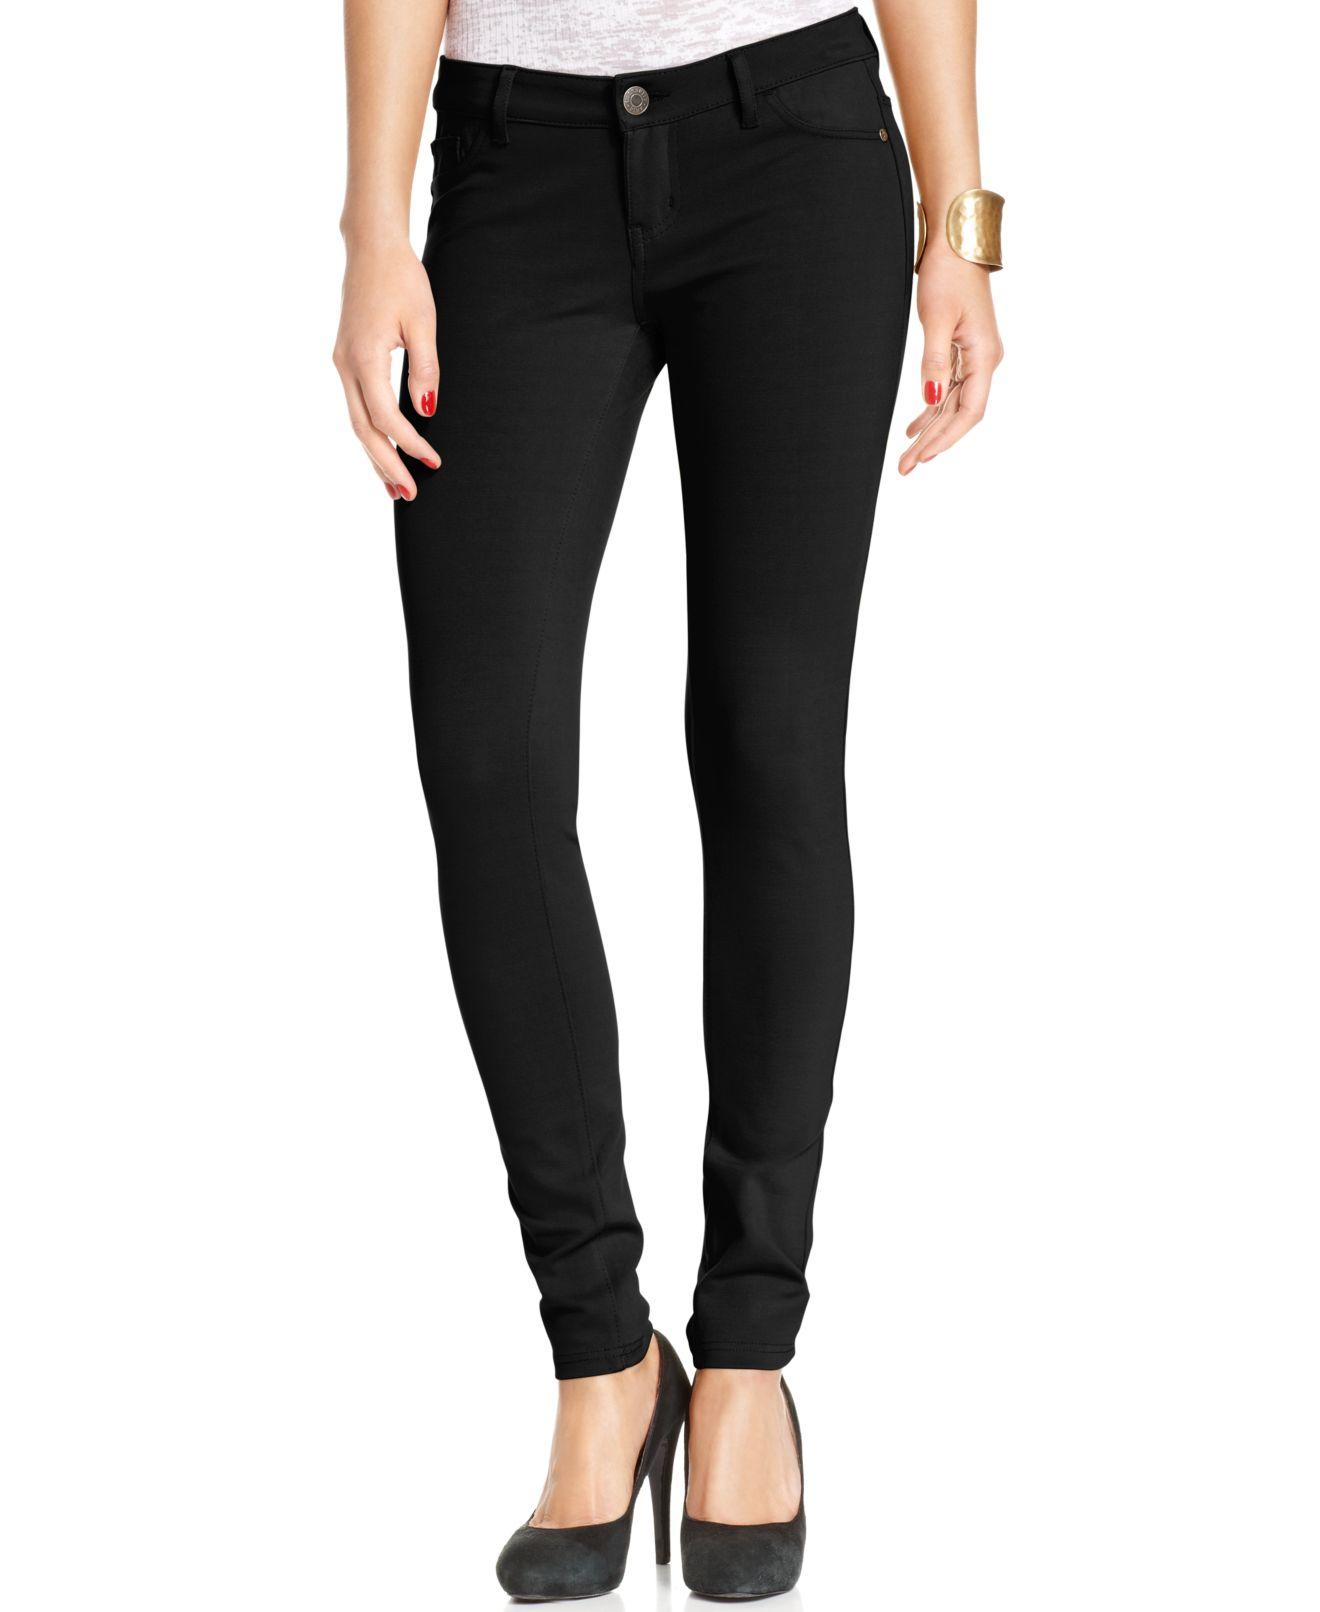 Black Dress Pants For Juniors